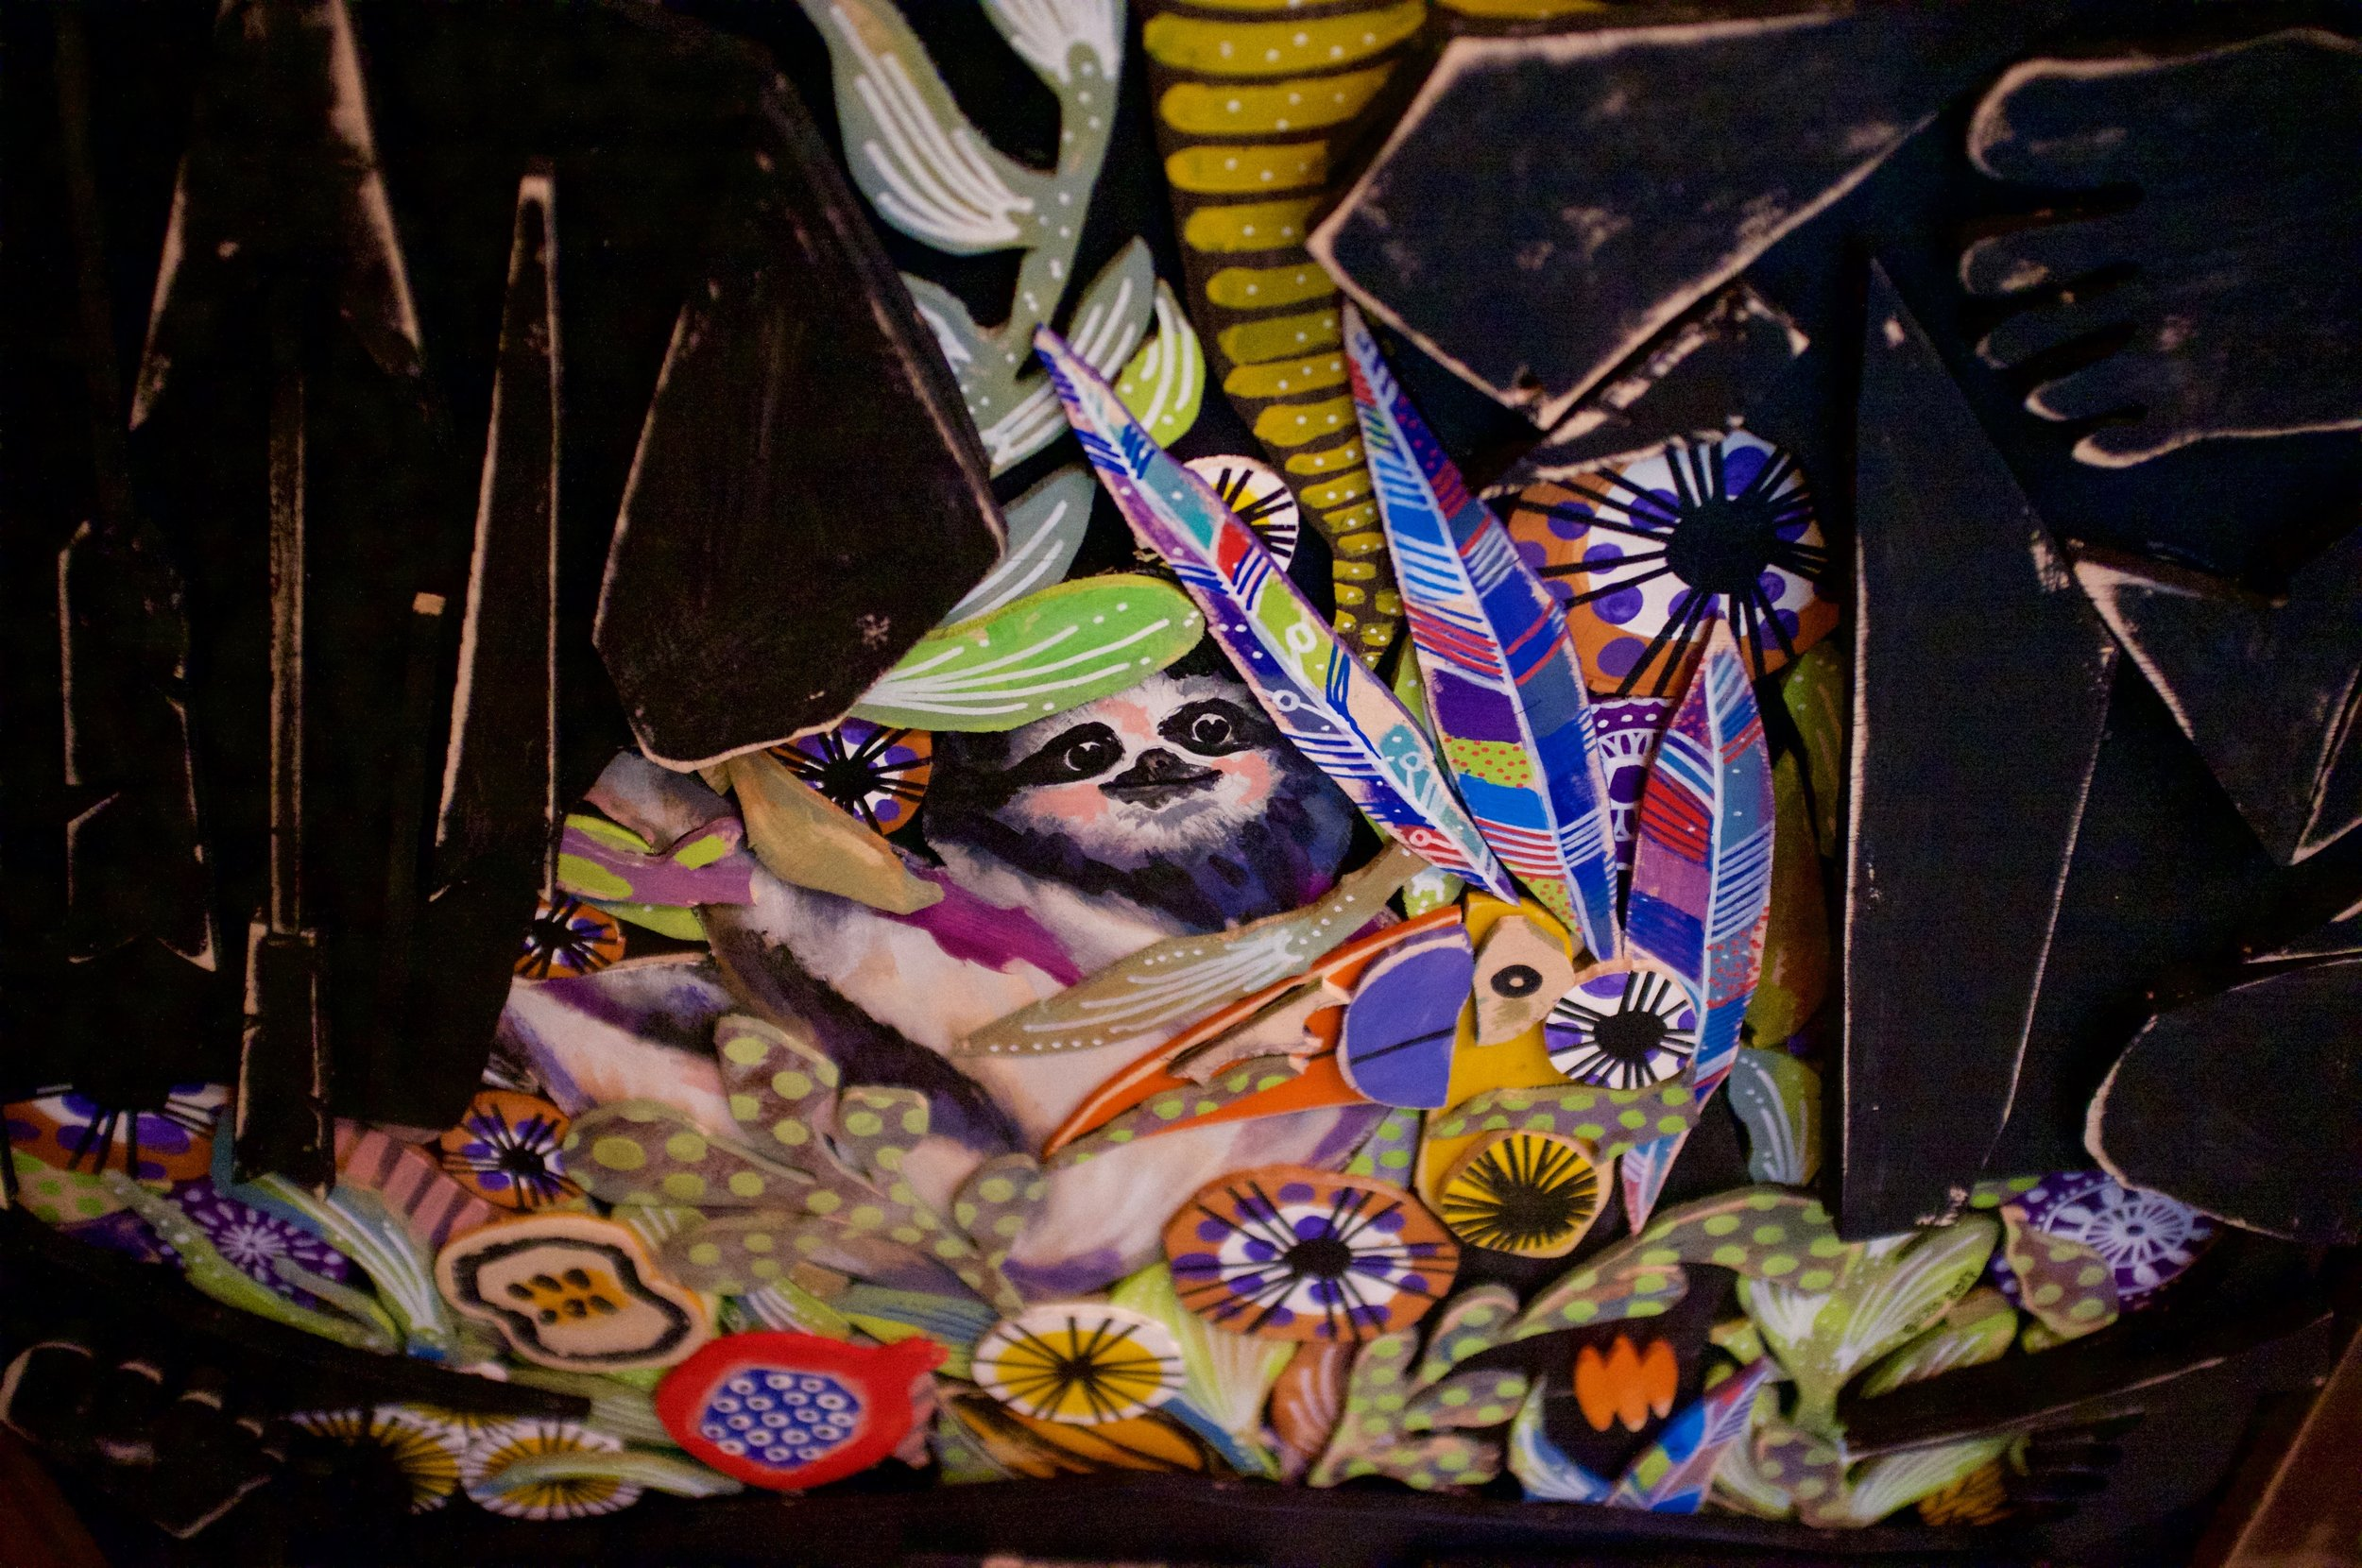 Oficina Marques Gezo Marques Favela samba no pé (6).jpg